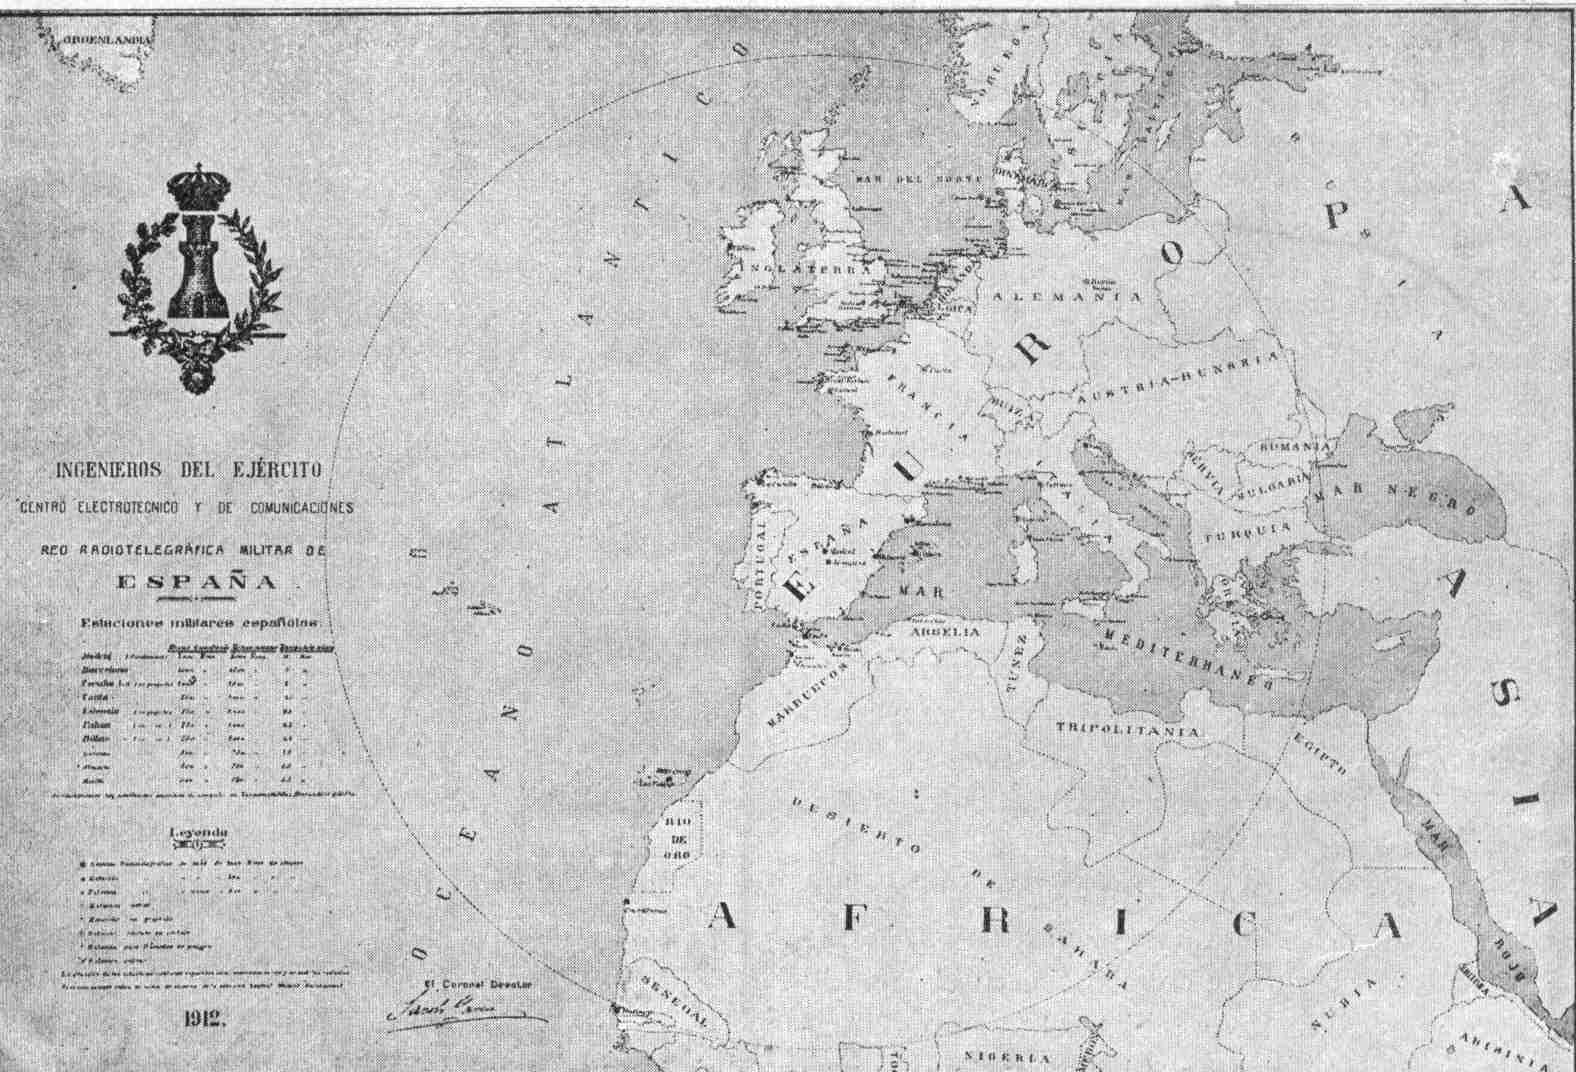 [mapa_ingenieros.jpg]